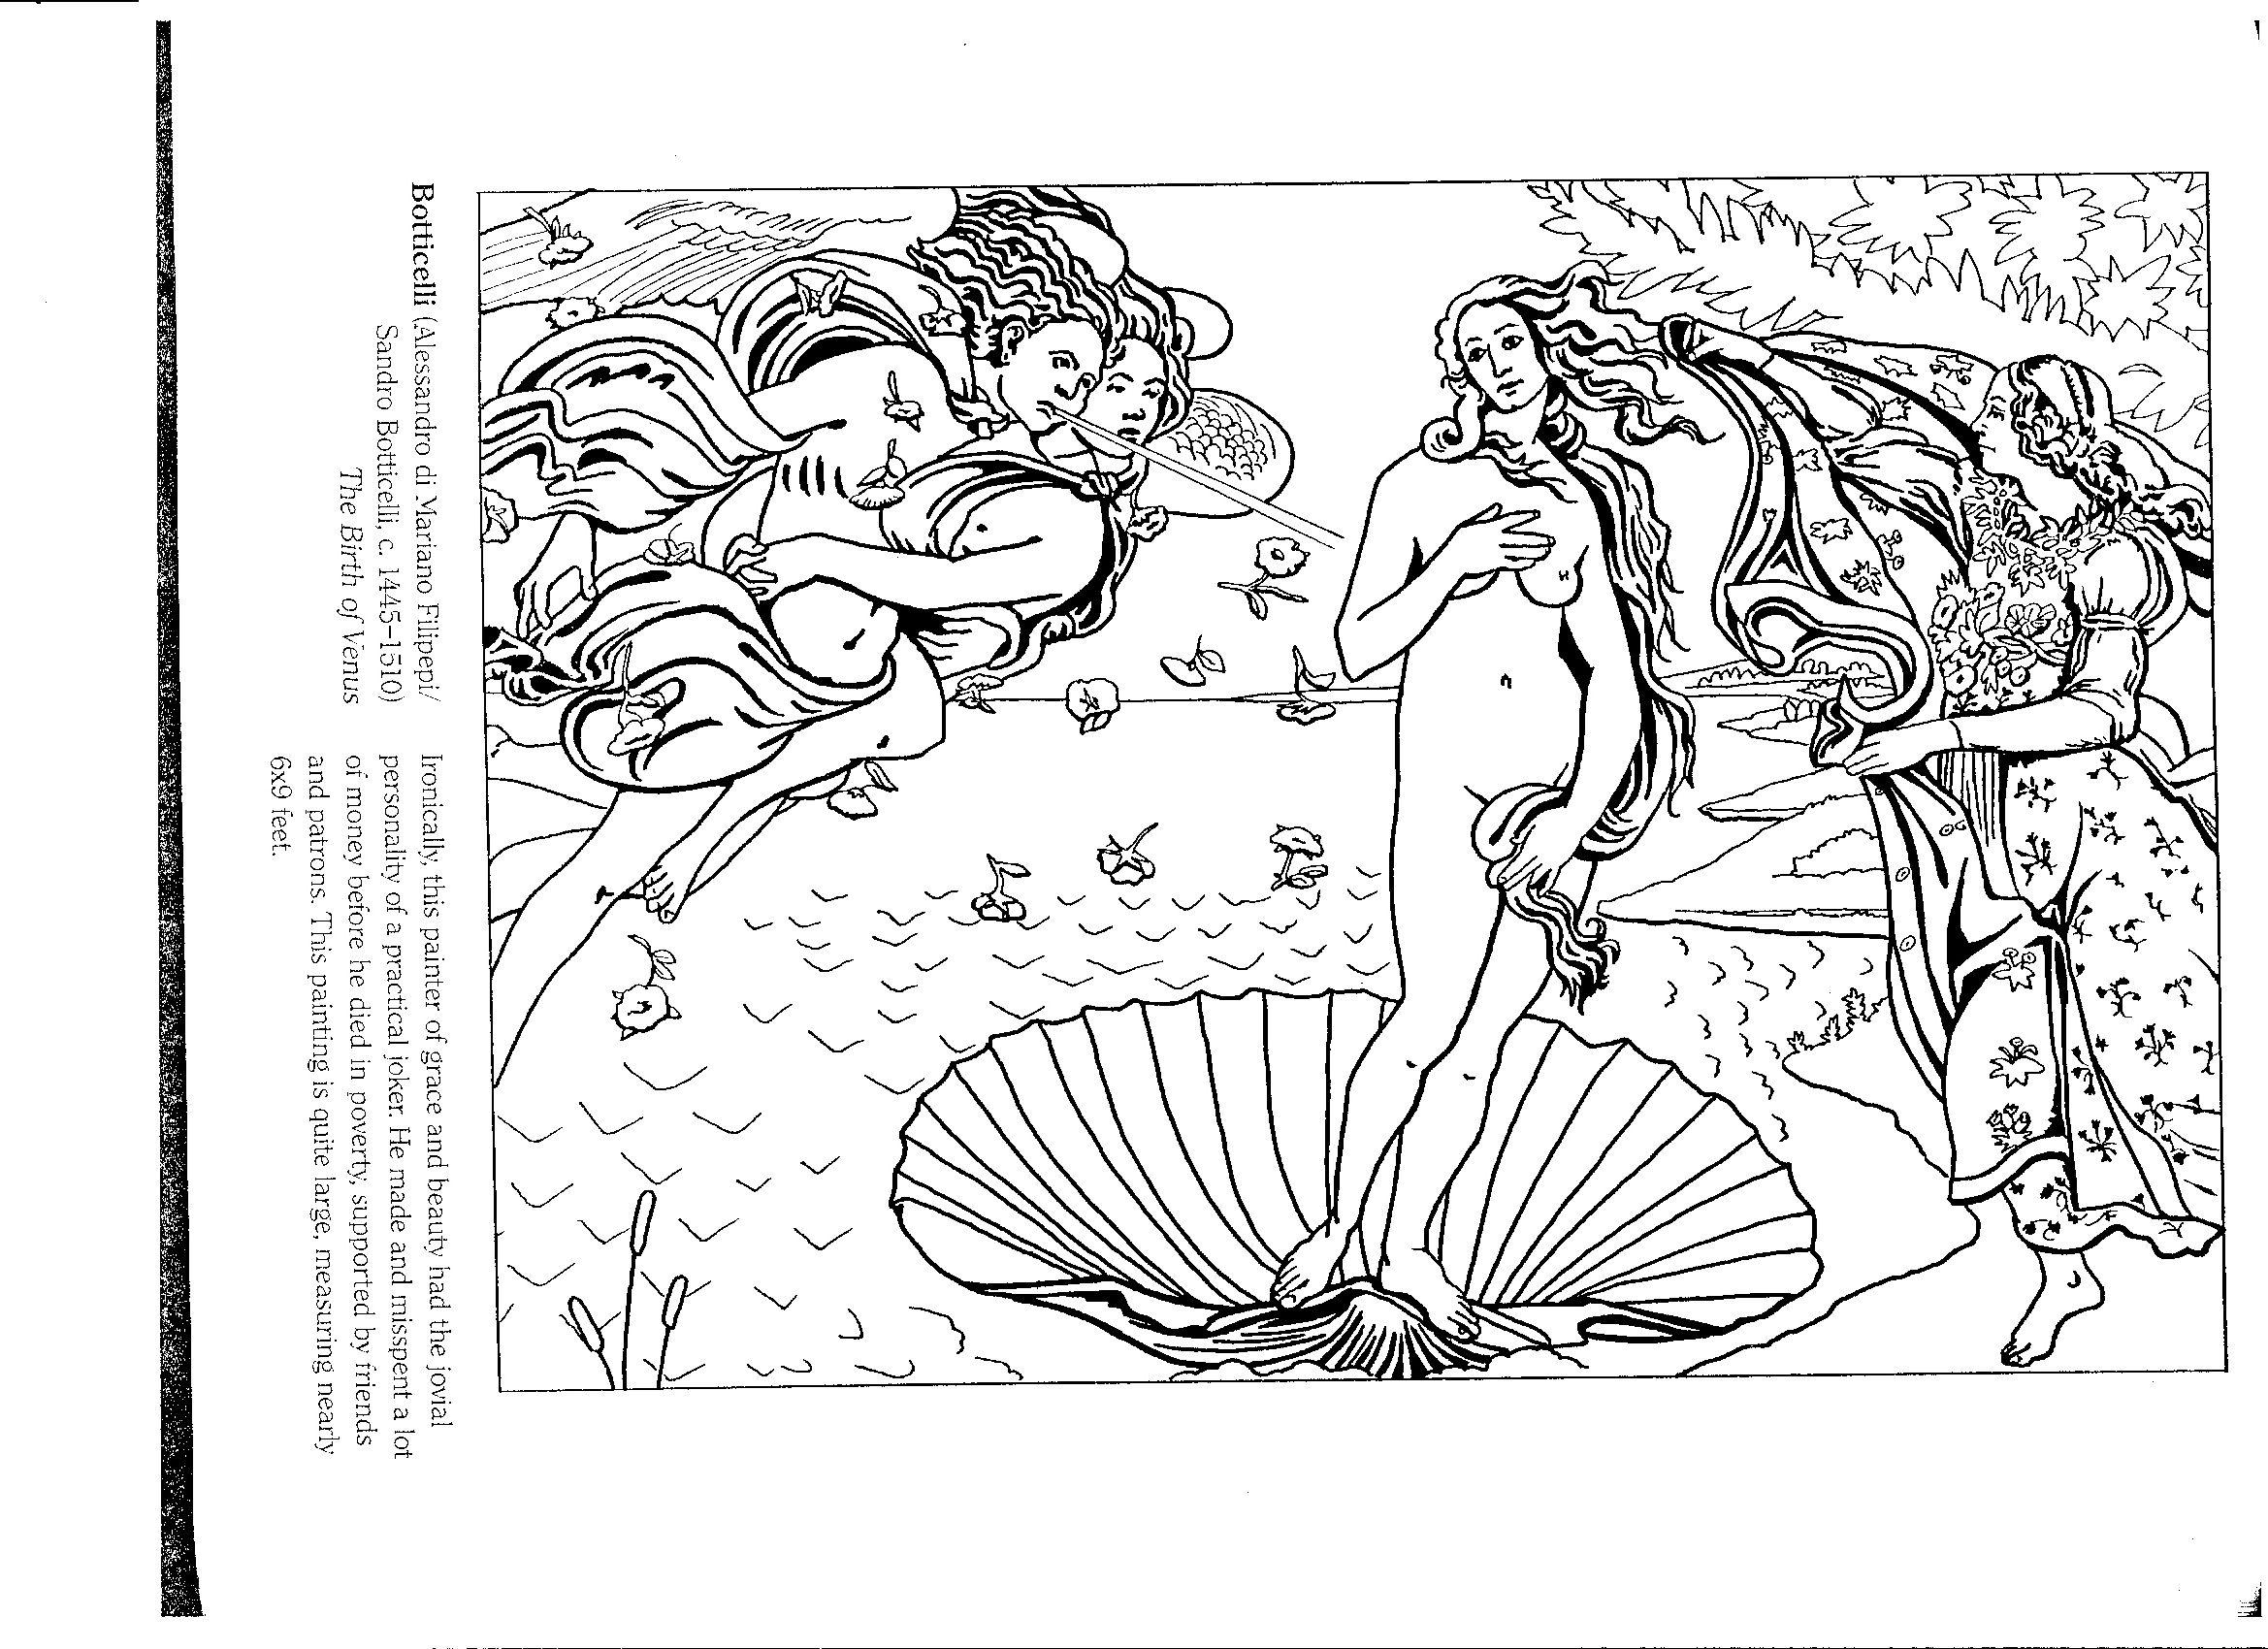 Birth of venus 2338 1700 colouring sheetsvenuscolor